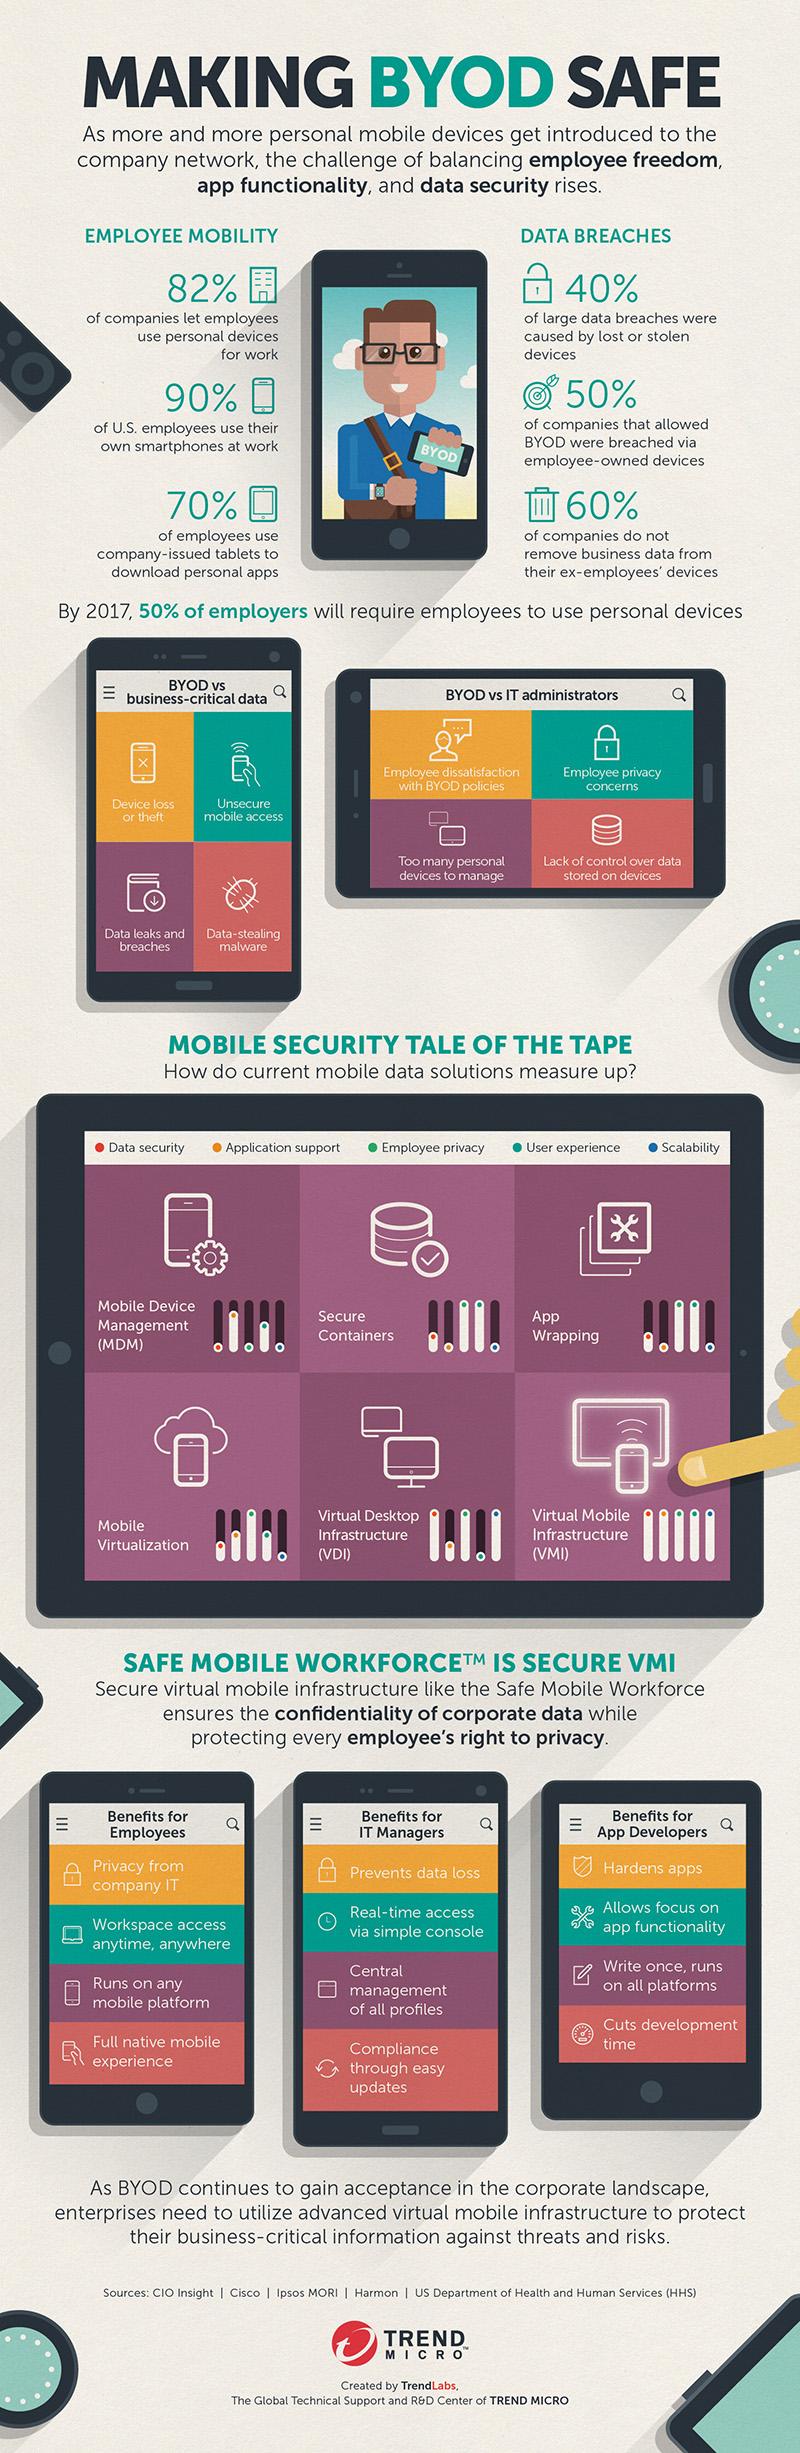 Making BYOD safe